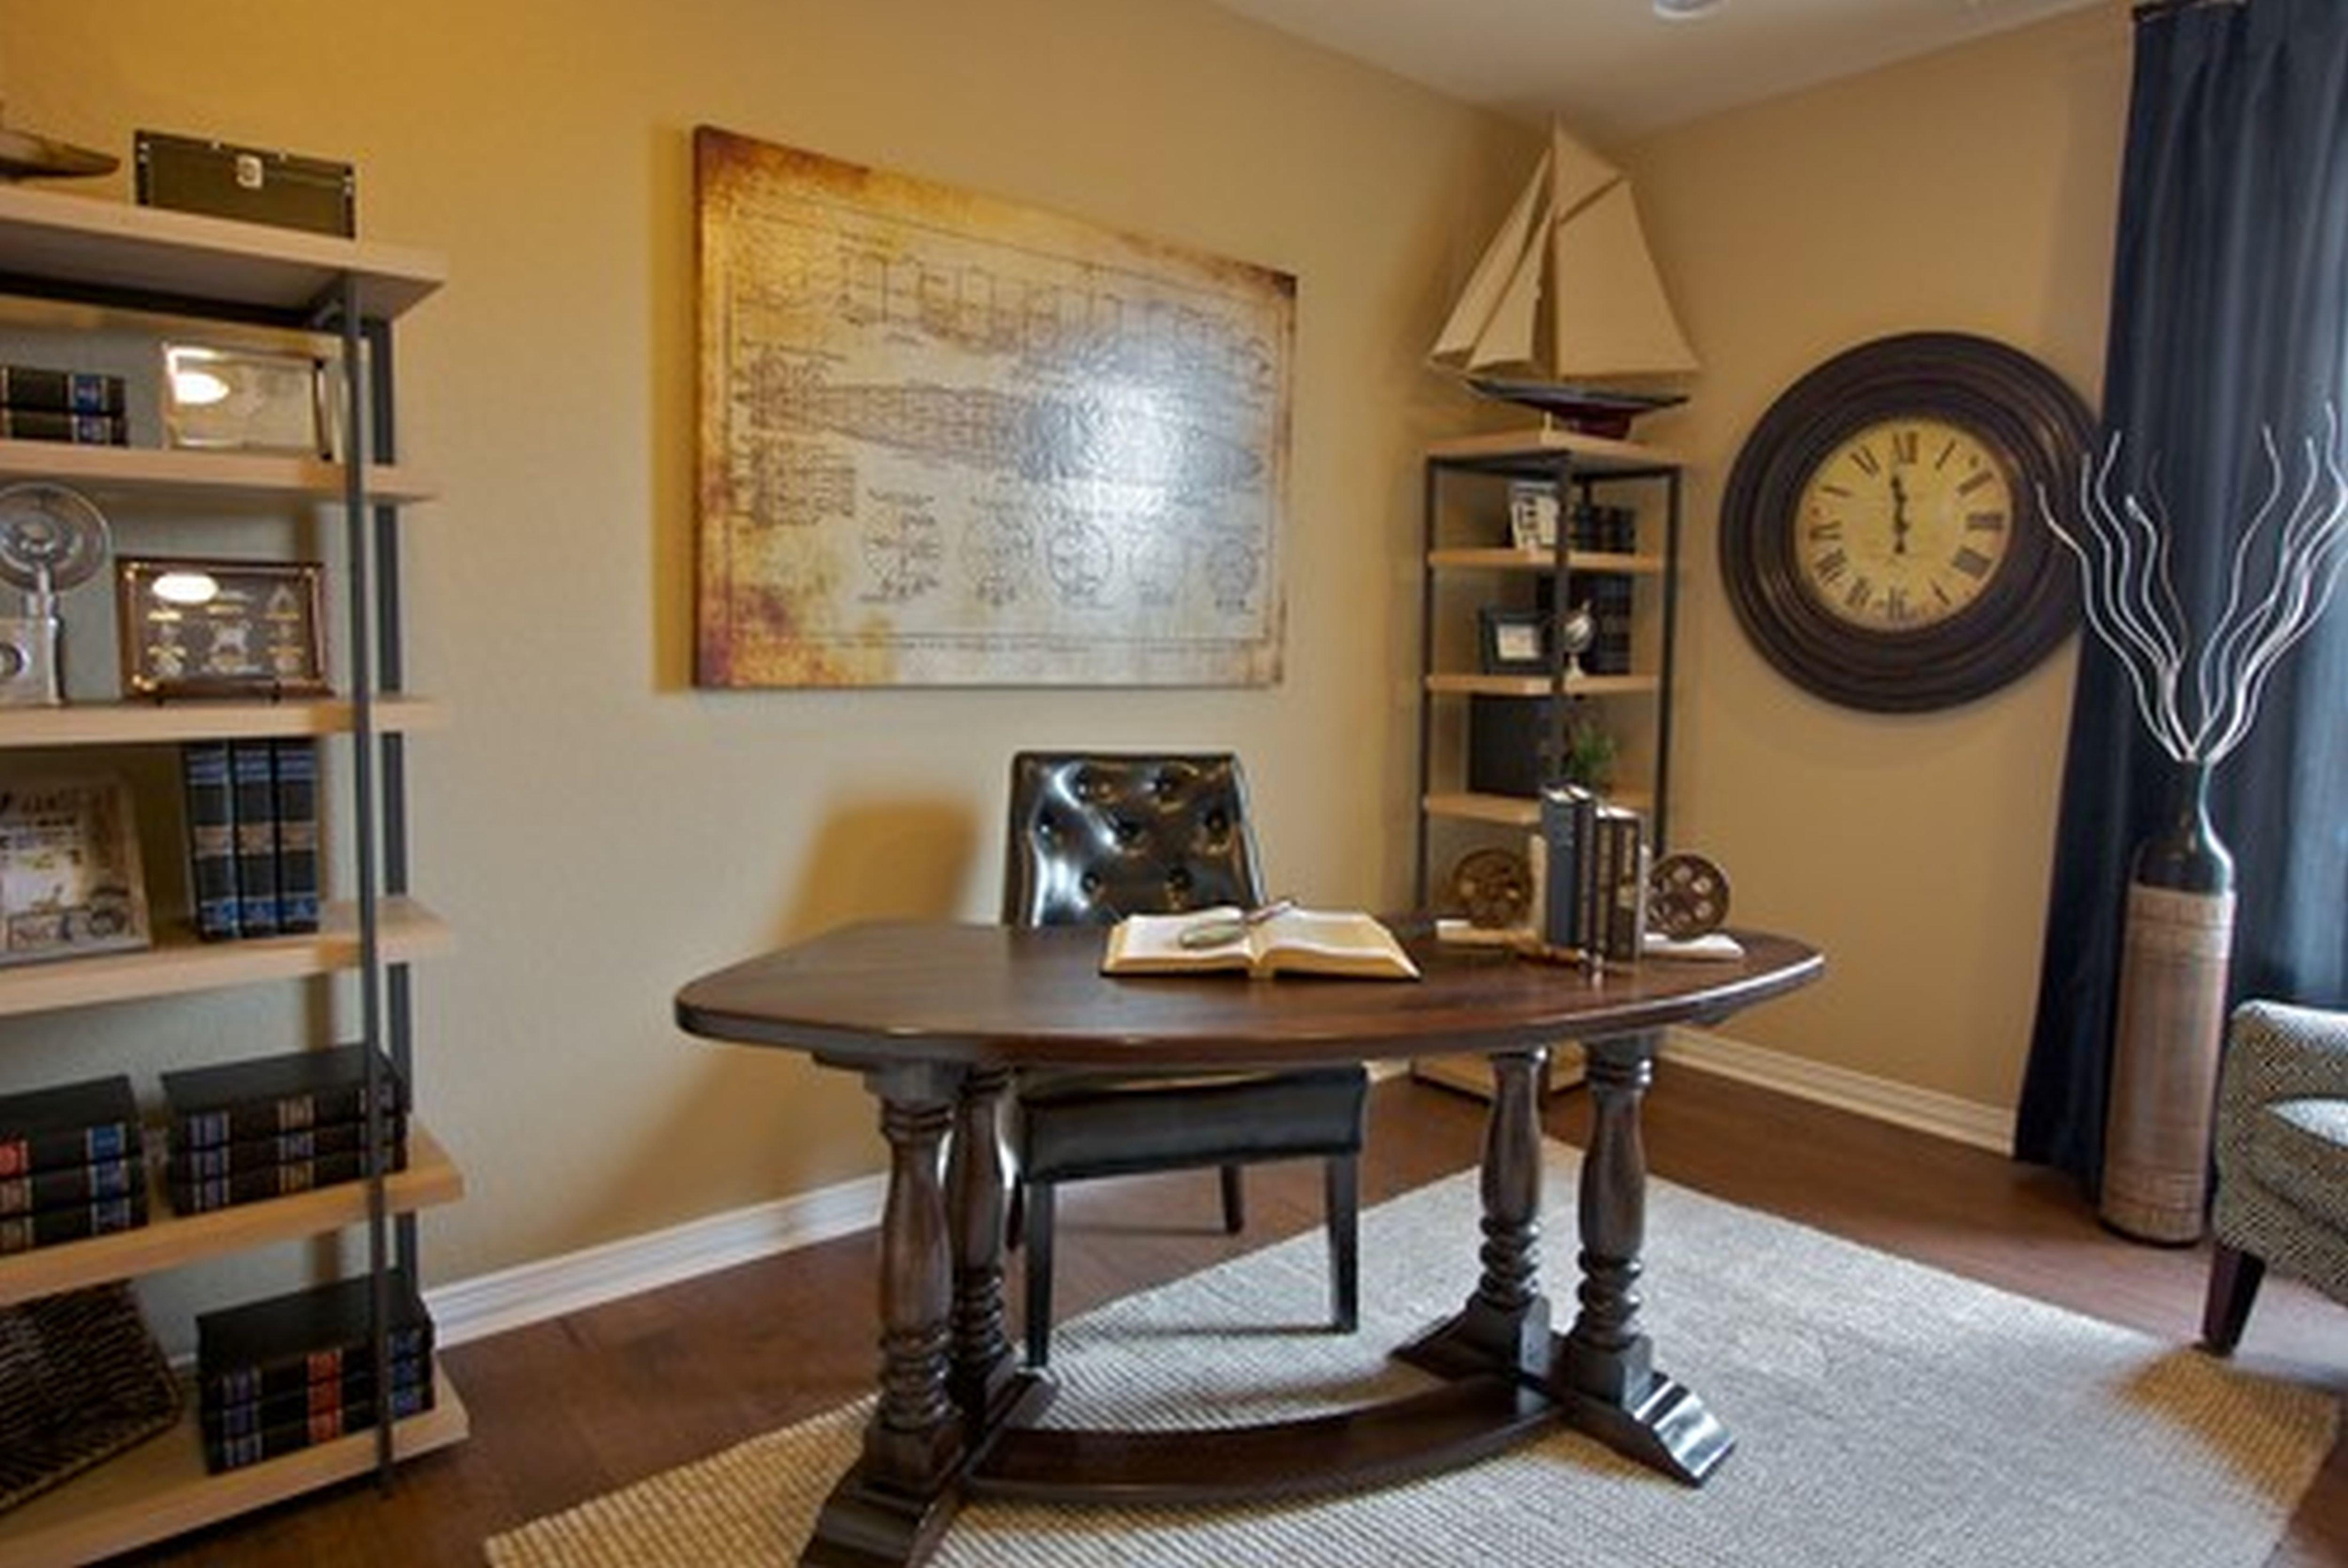 10 Stunning Home Office Ideas For Men home office design ideas for men internetunblock